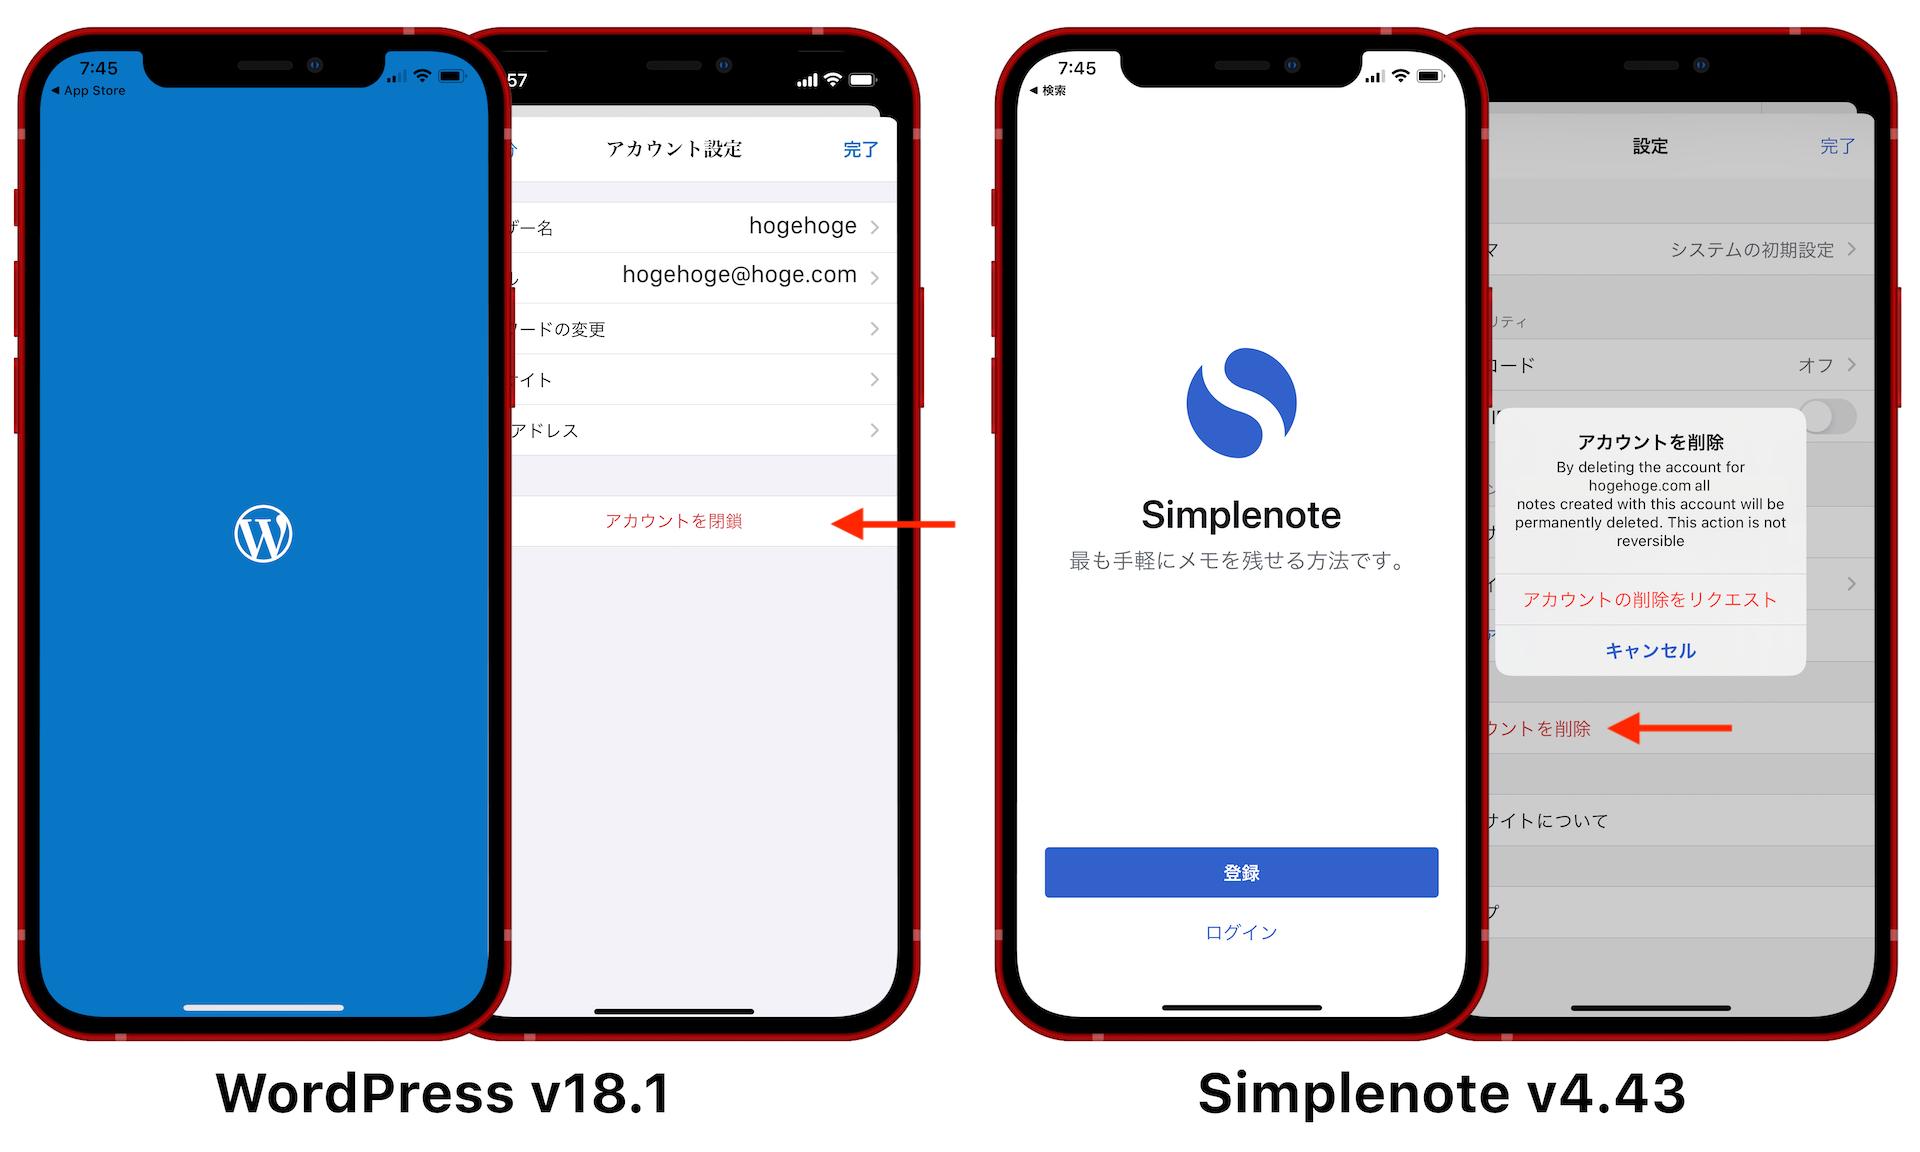 WordPressとSimplenote for iOS